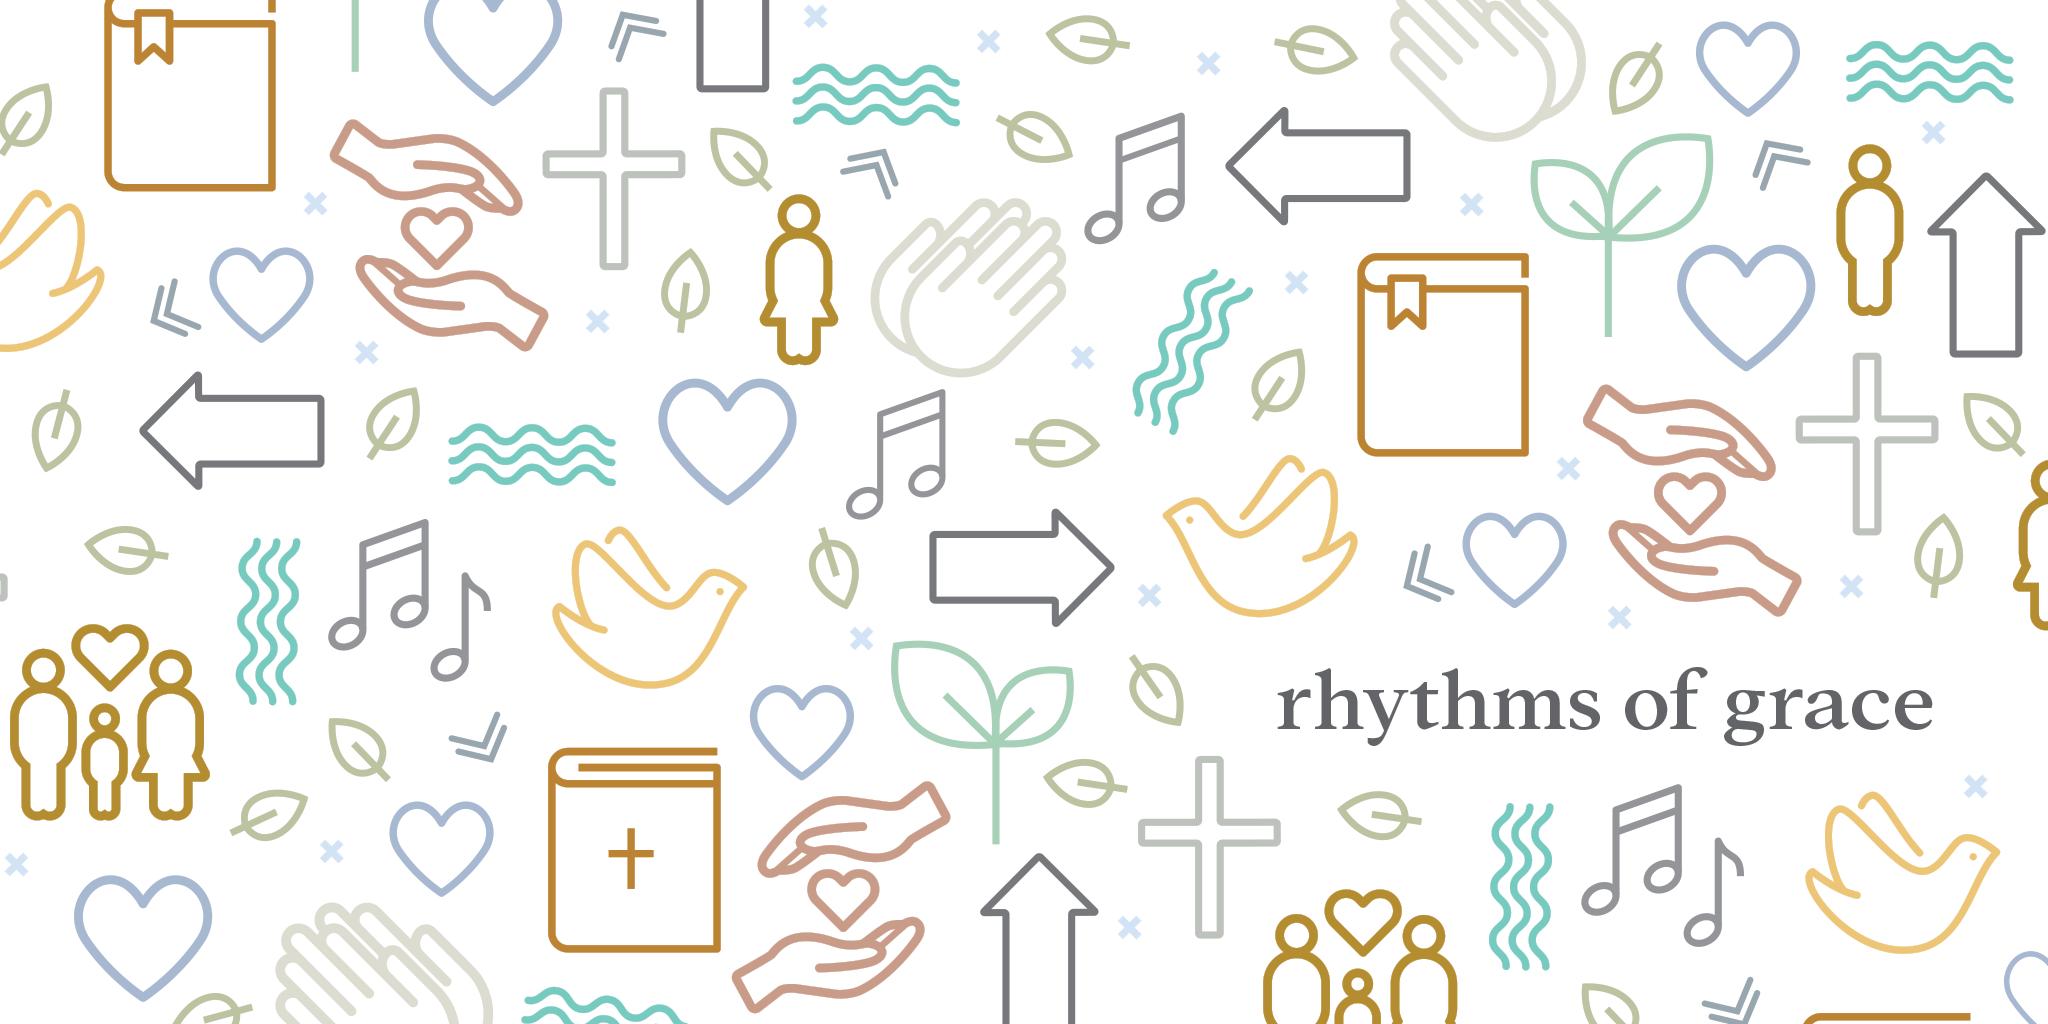 rhythms of grace art